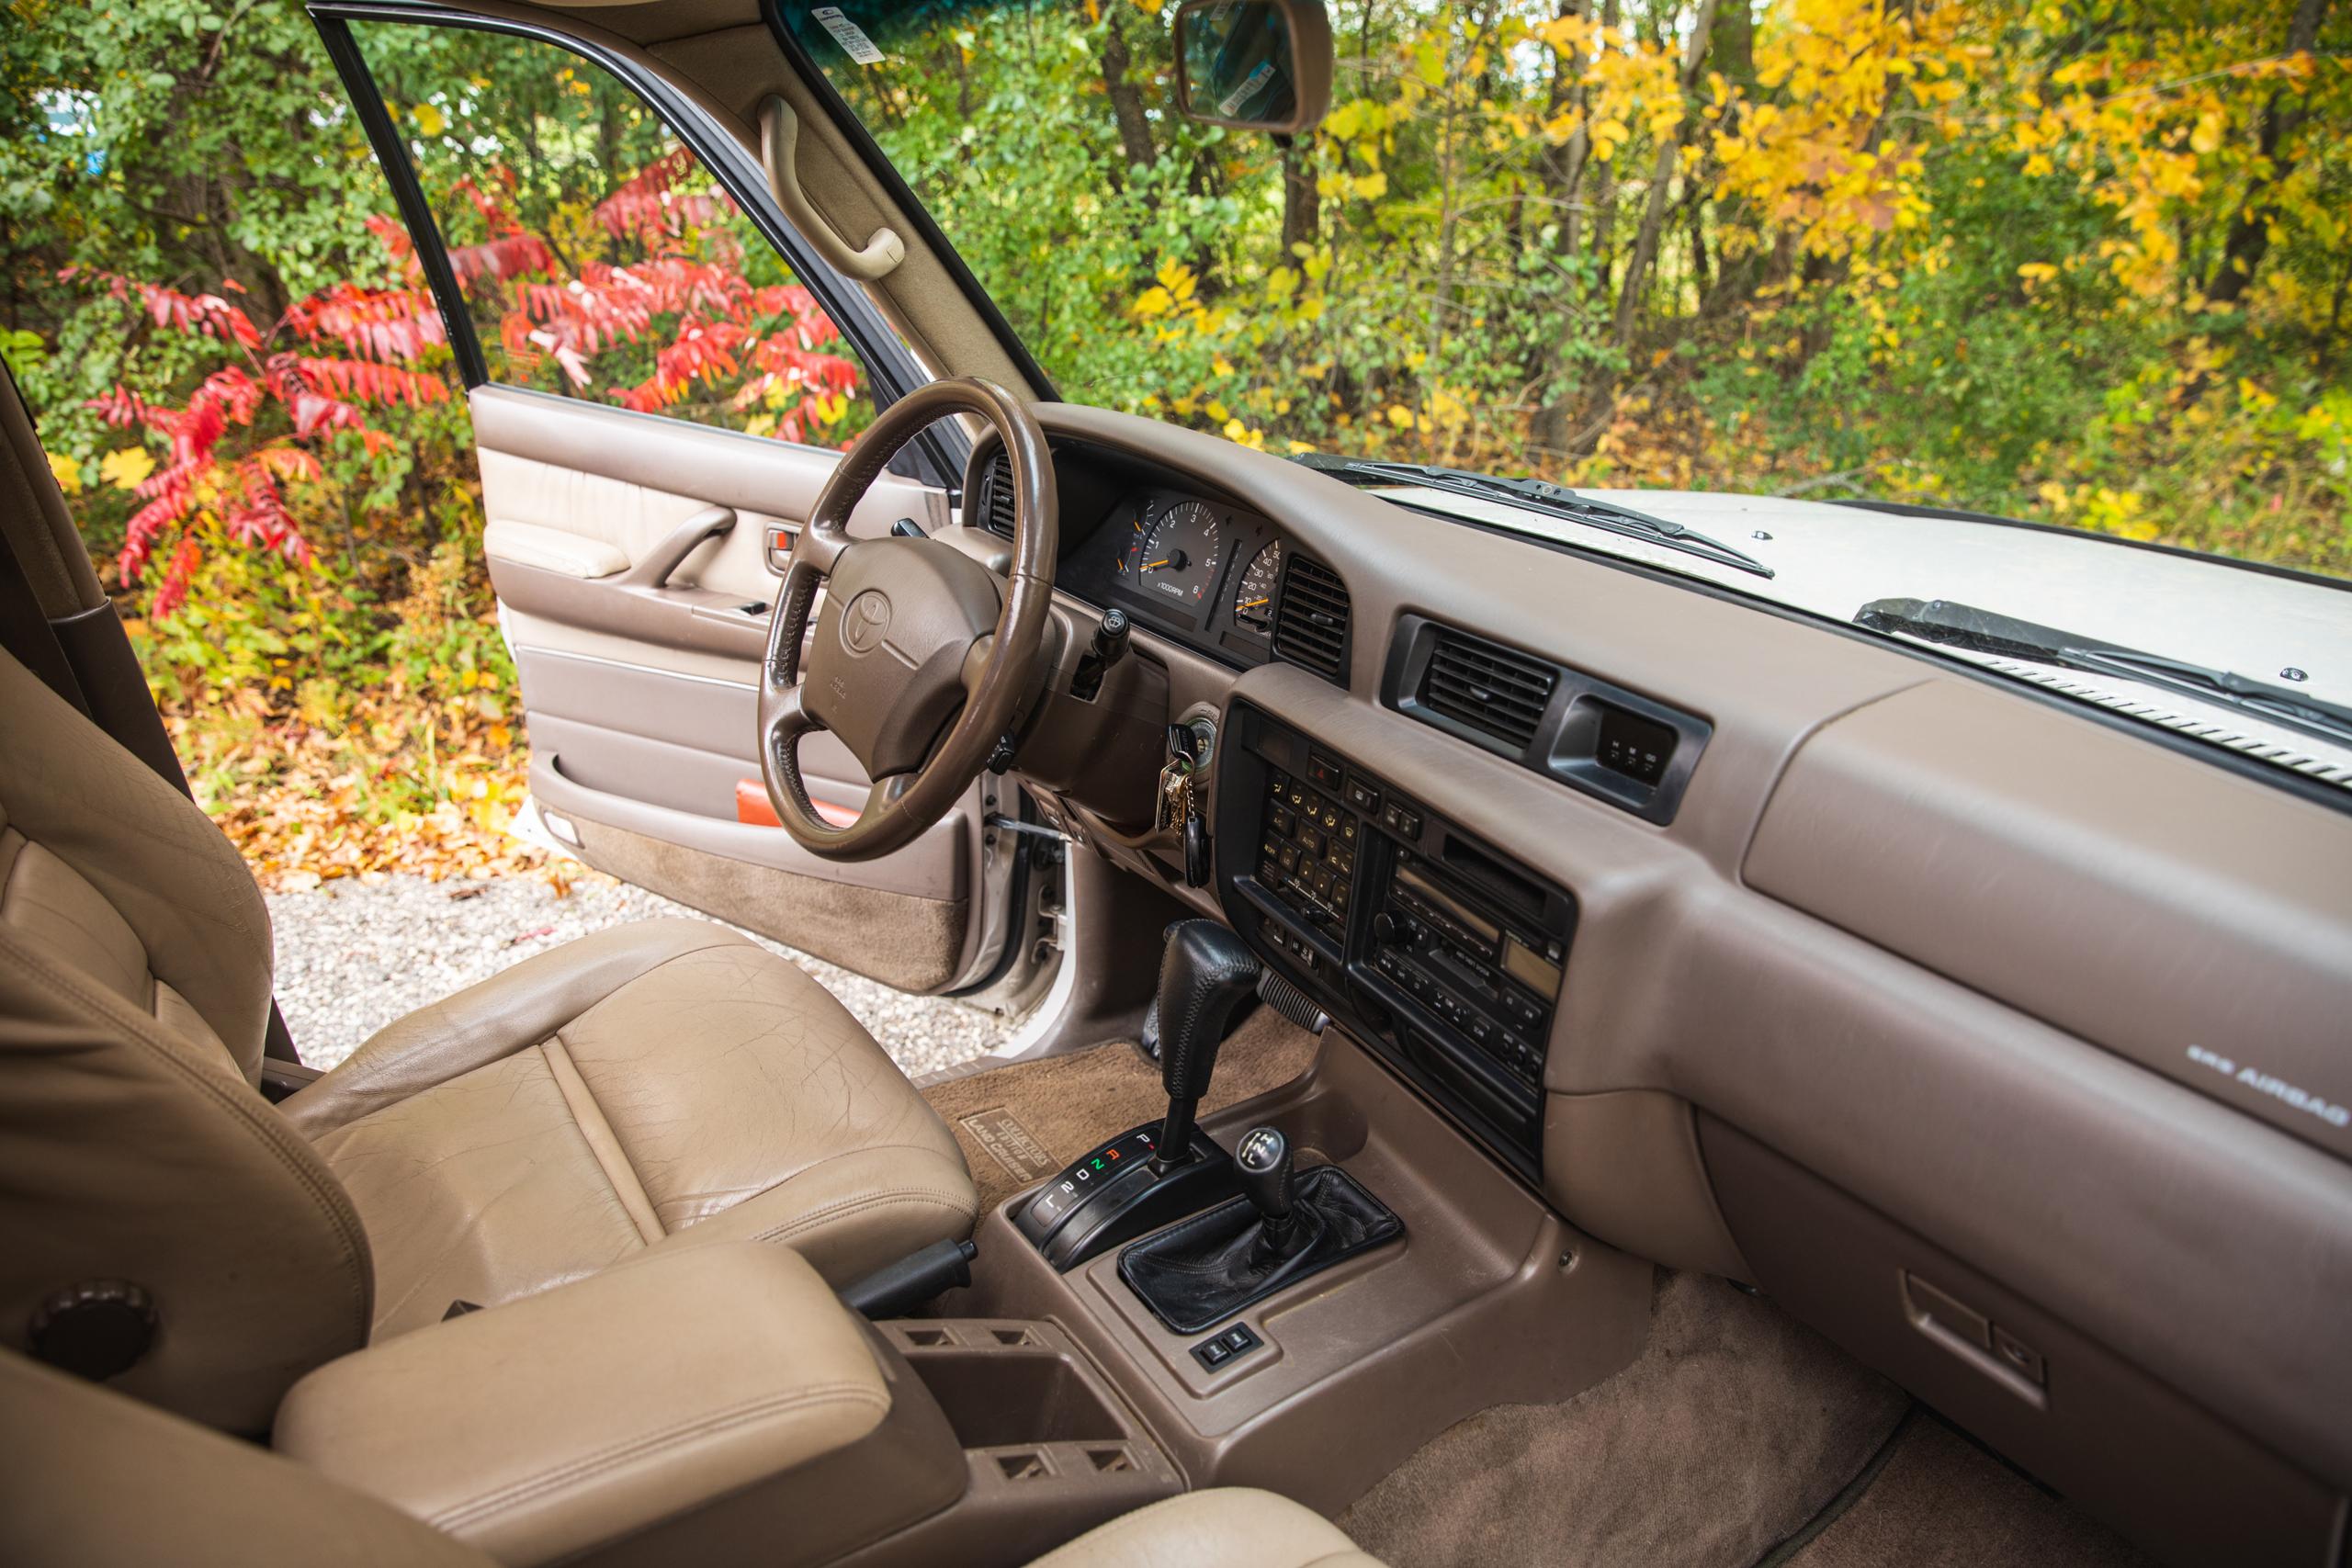 Toyota Land Cruiser FZJ80 front interior angle